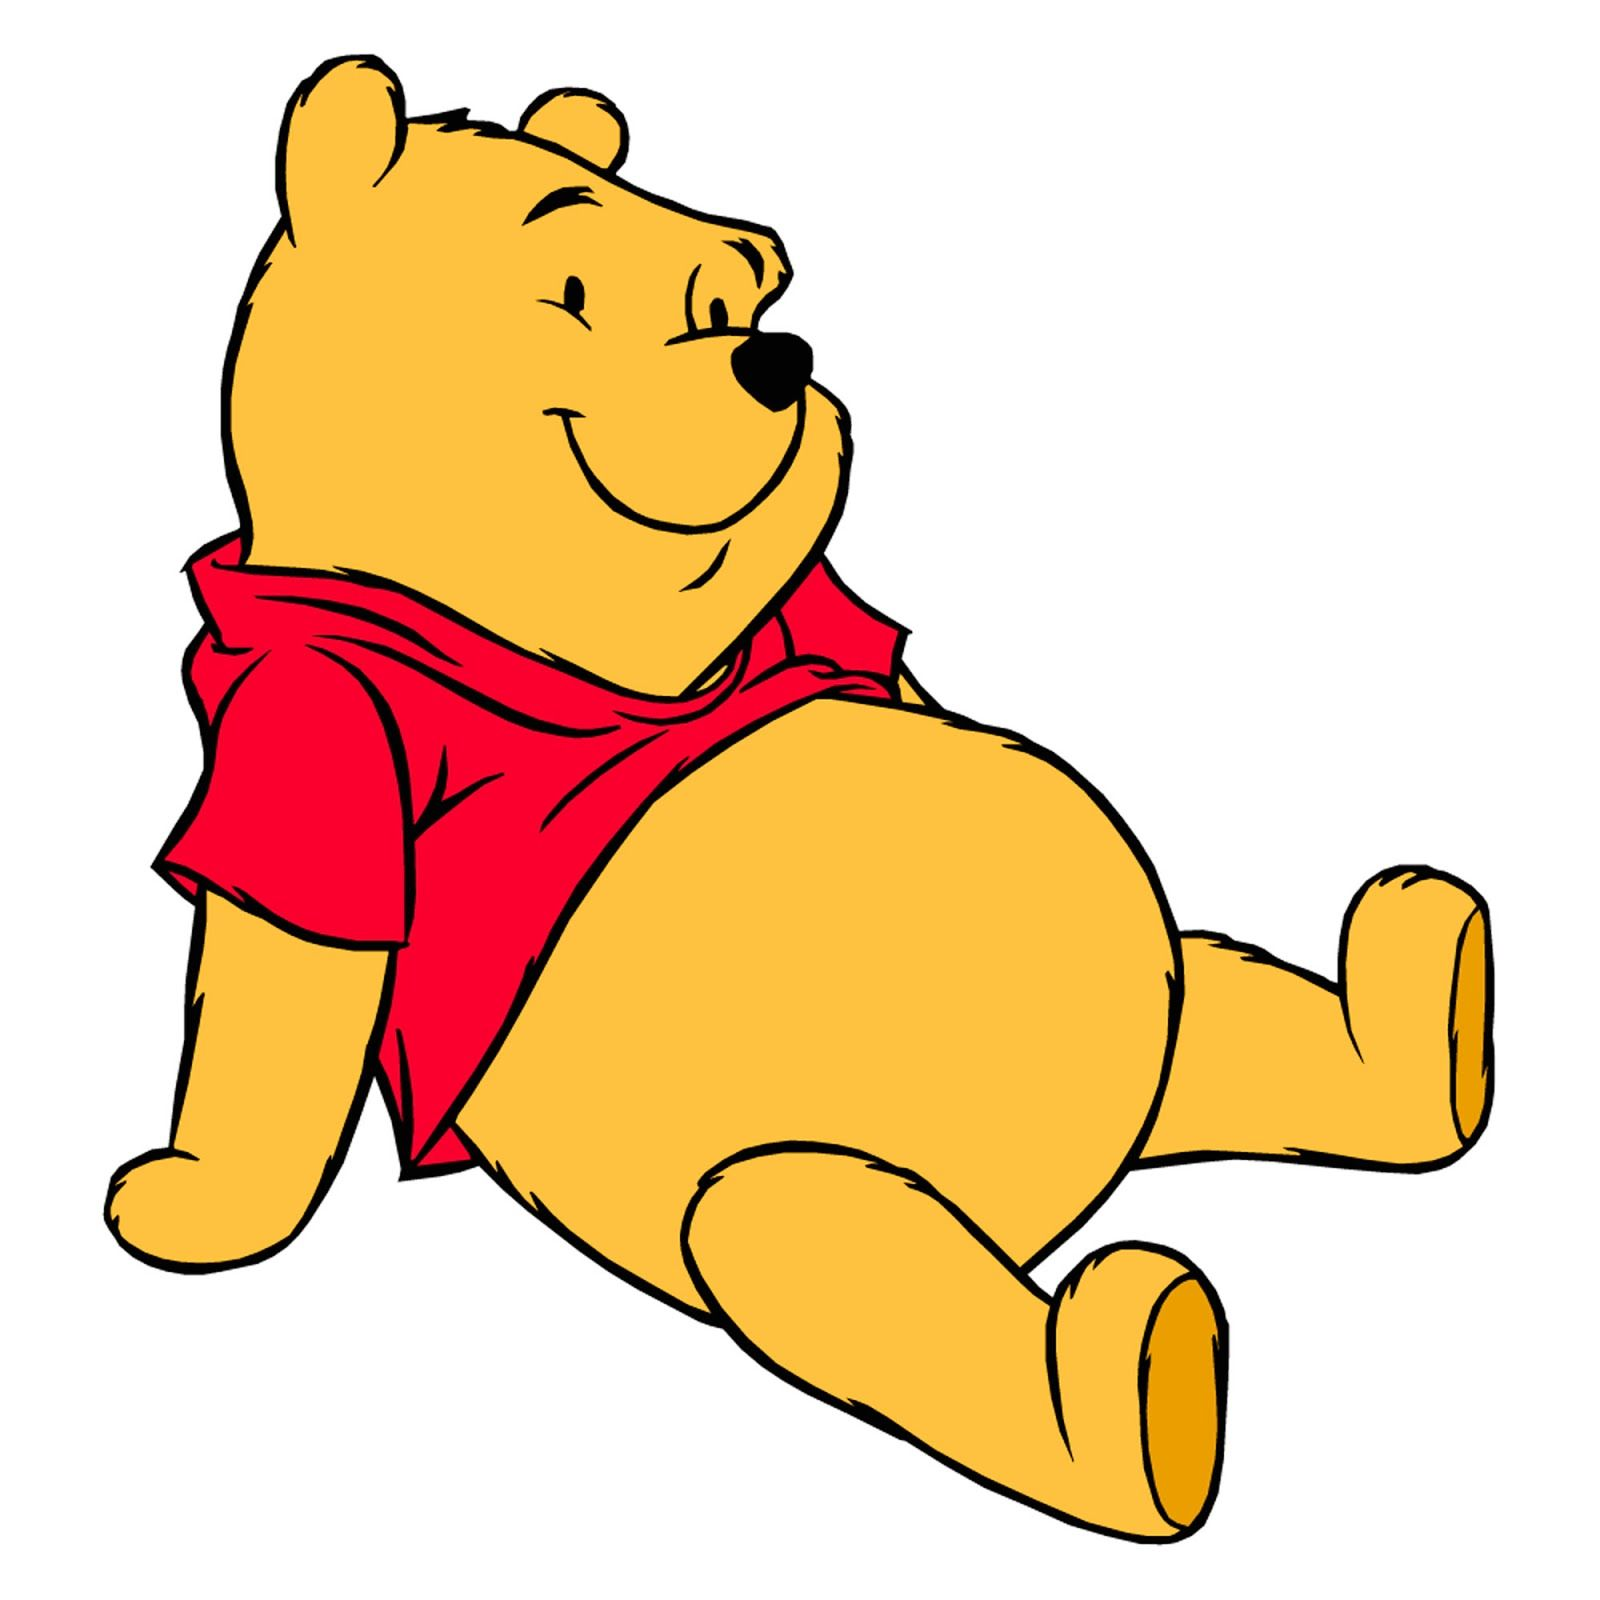 10 Mewarnai Gambar Winnie The Pooh Dengan Gambar Gambar